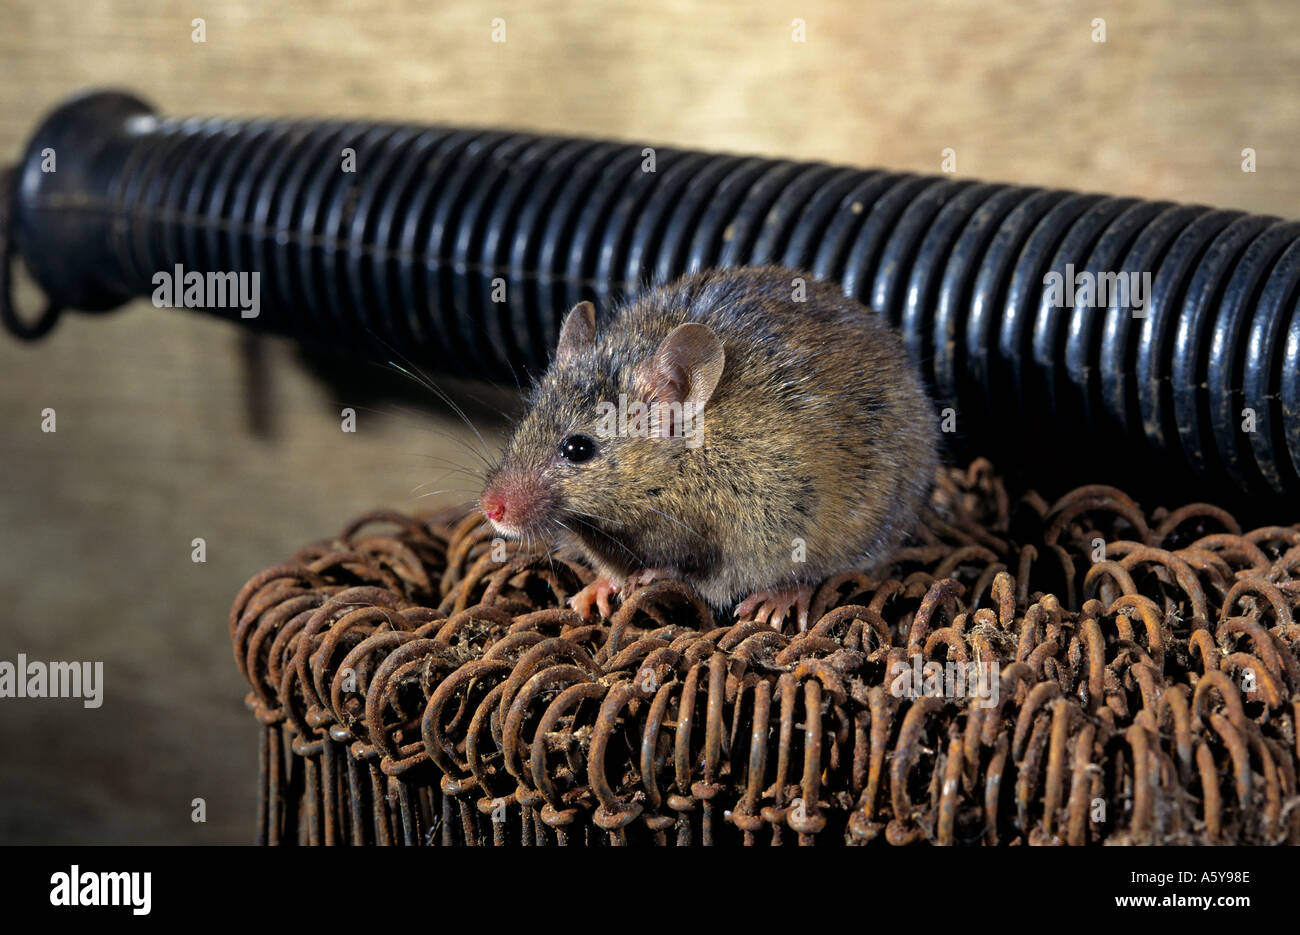 House Mouse Uk Stockfotos & House Mouse Uk Bilder - Seite 2 - Alamy